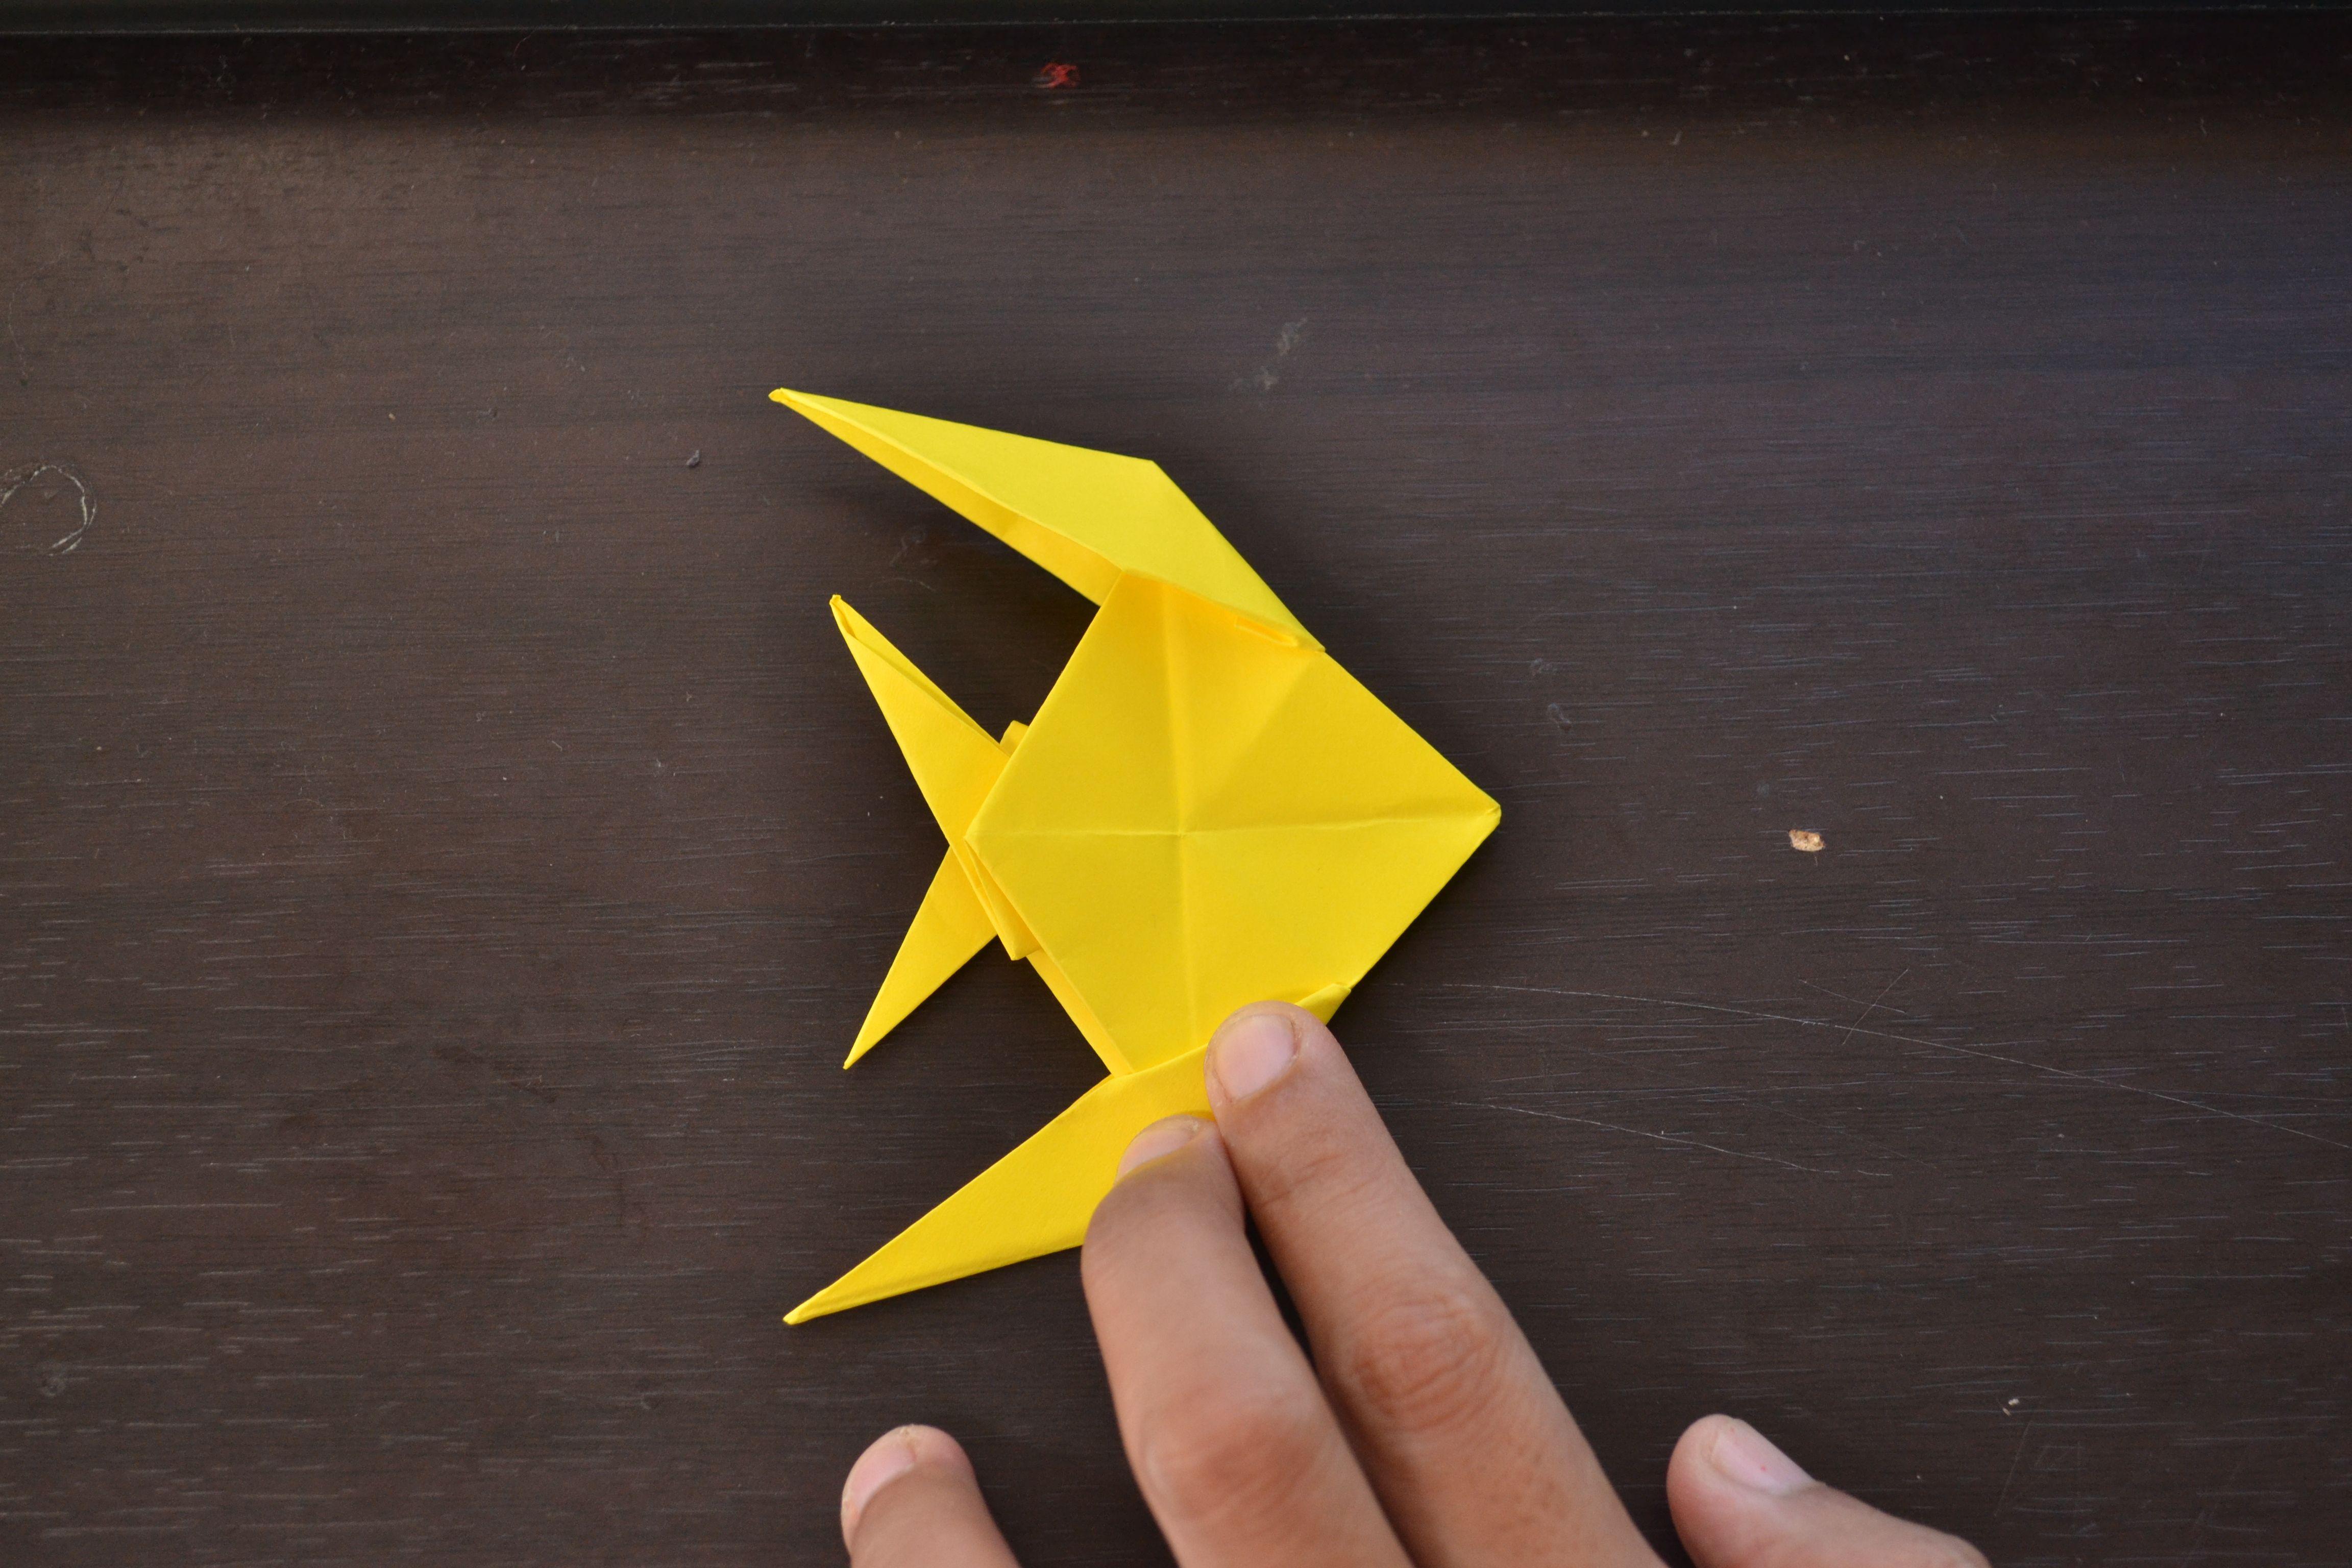 3 Ways to Make an Origami Flying Bird - wikiHow   3072x4608